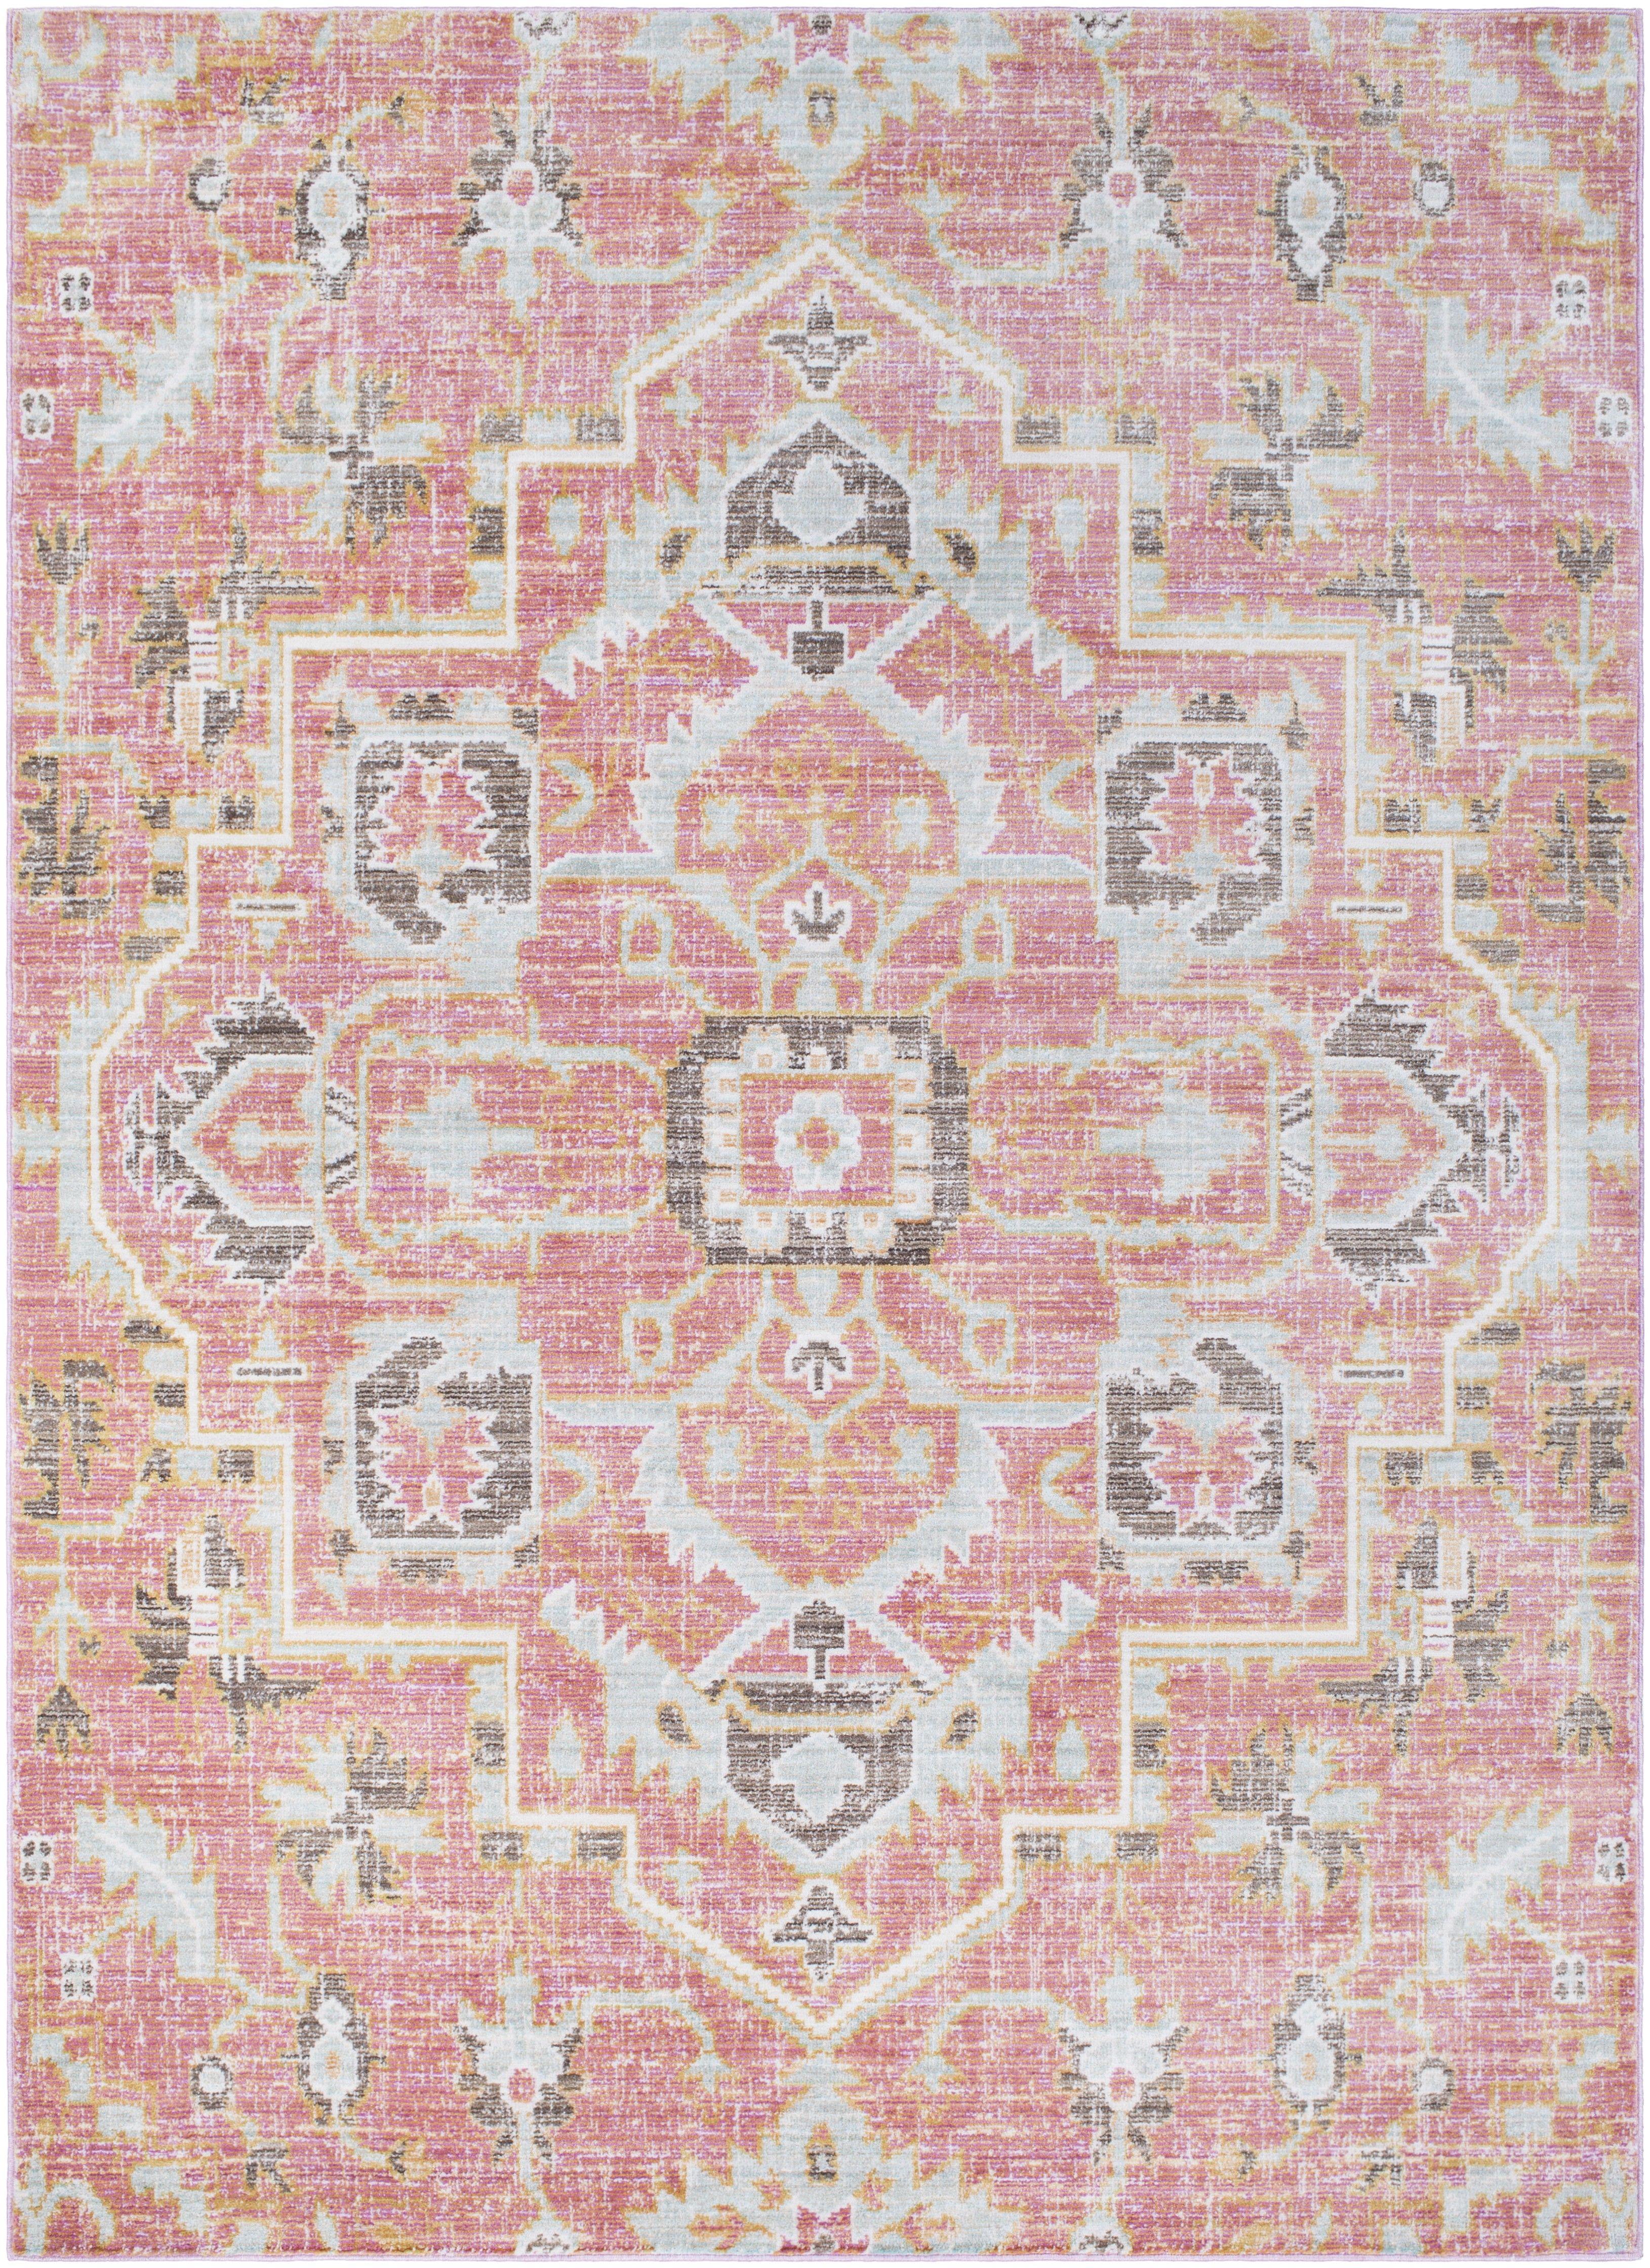 pink by area momeni pdx rug indooroutdoor novogratz indoor holiday reviews wayfair boho bohemian lilac pinklilac outdoor rugs